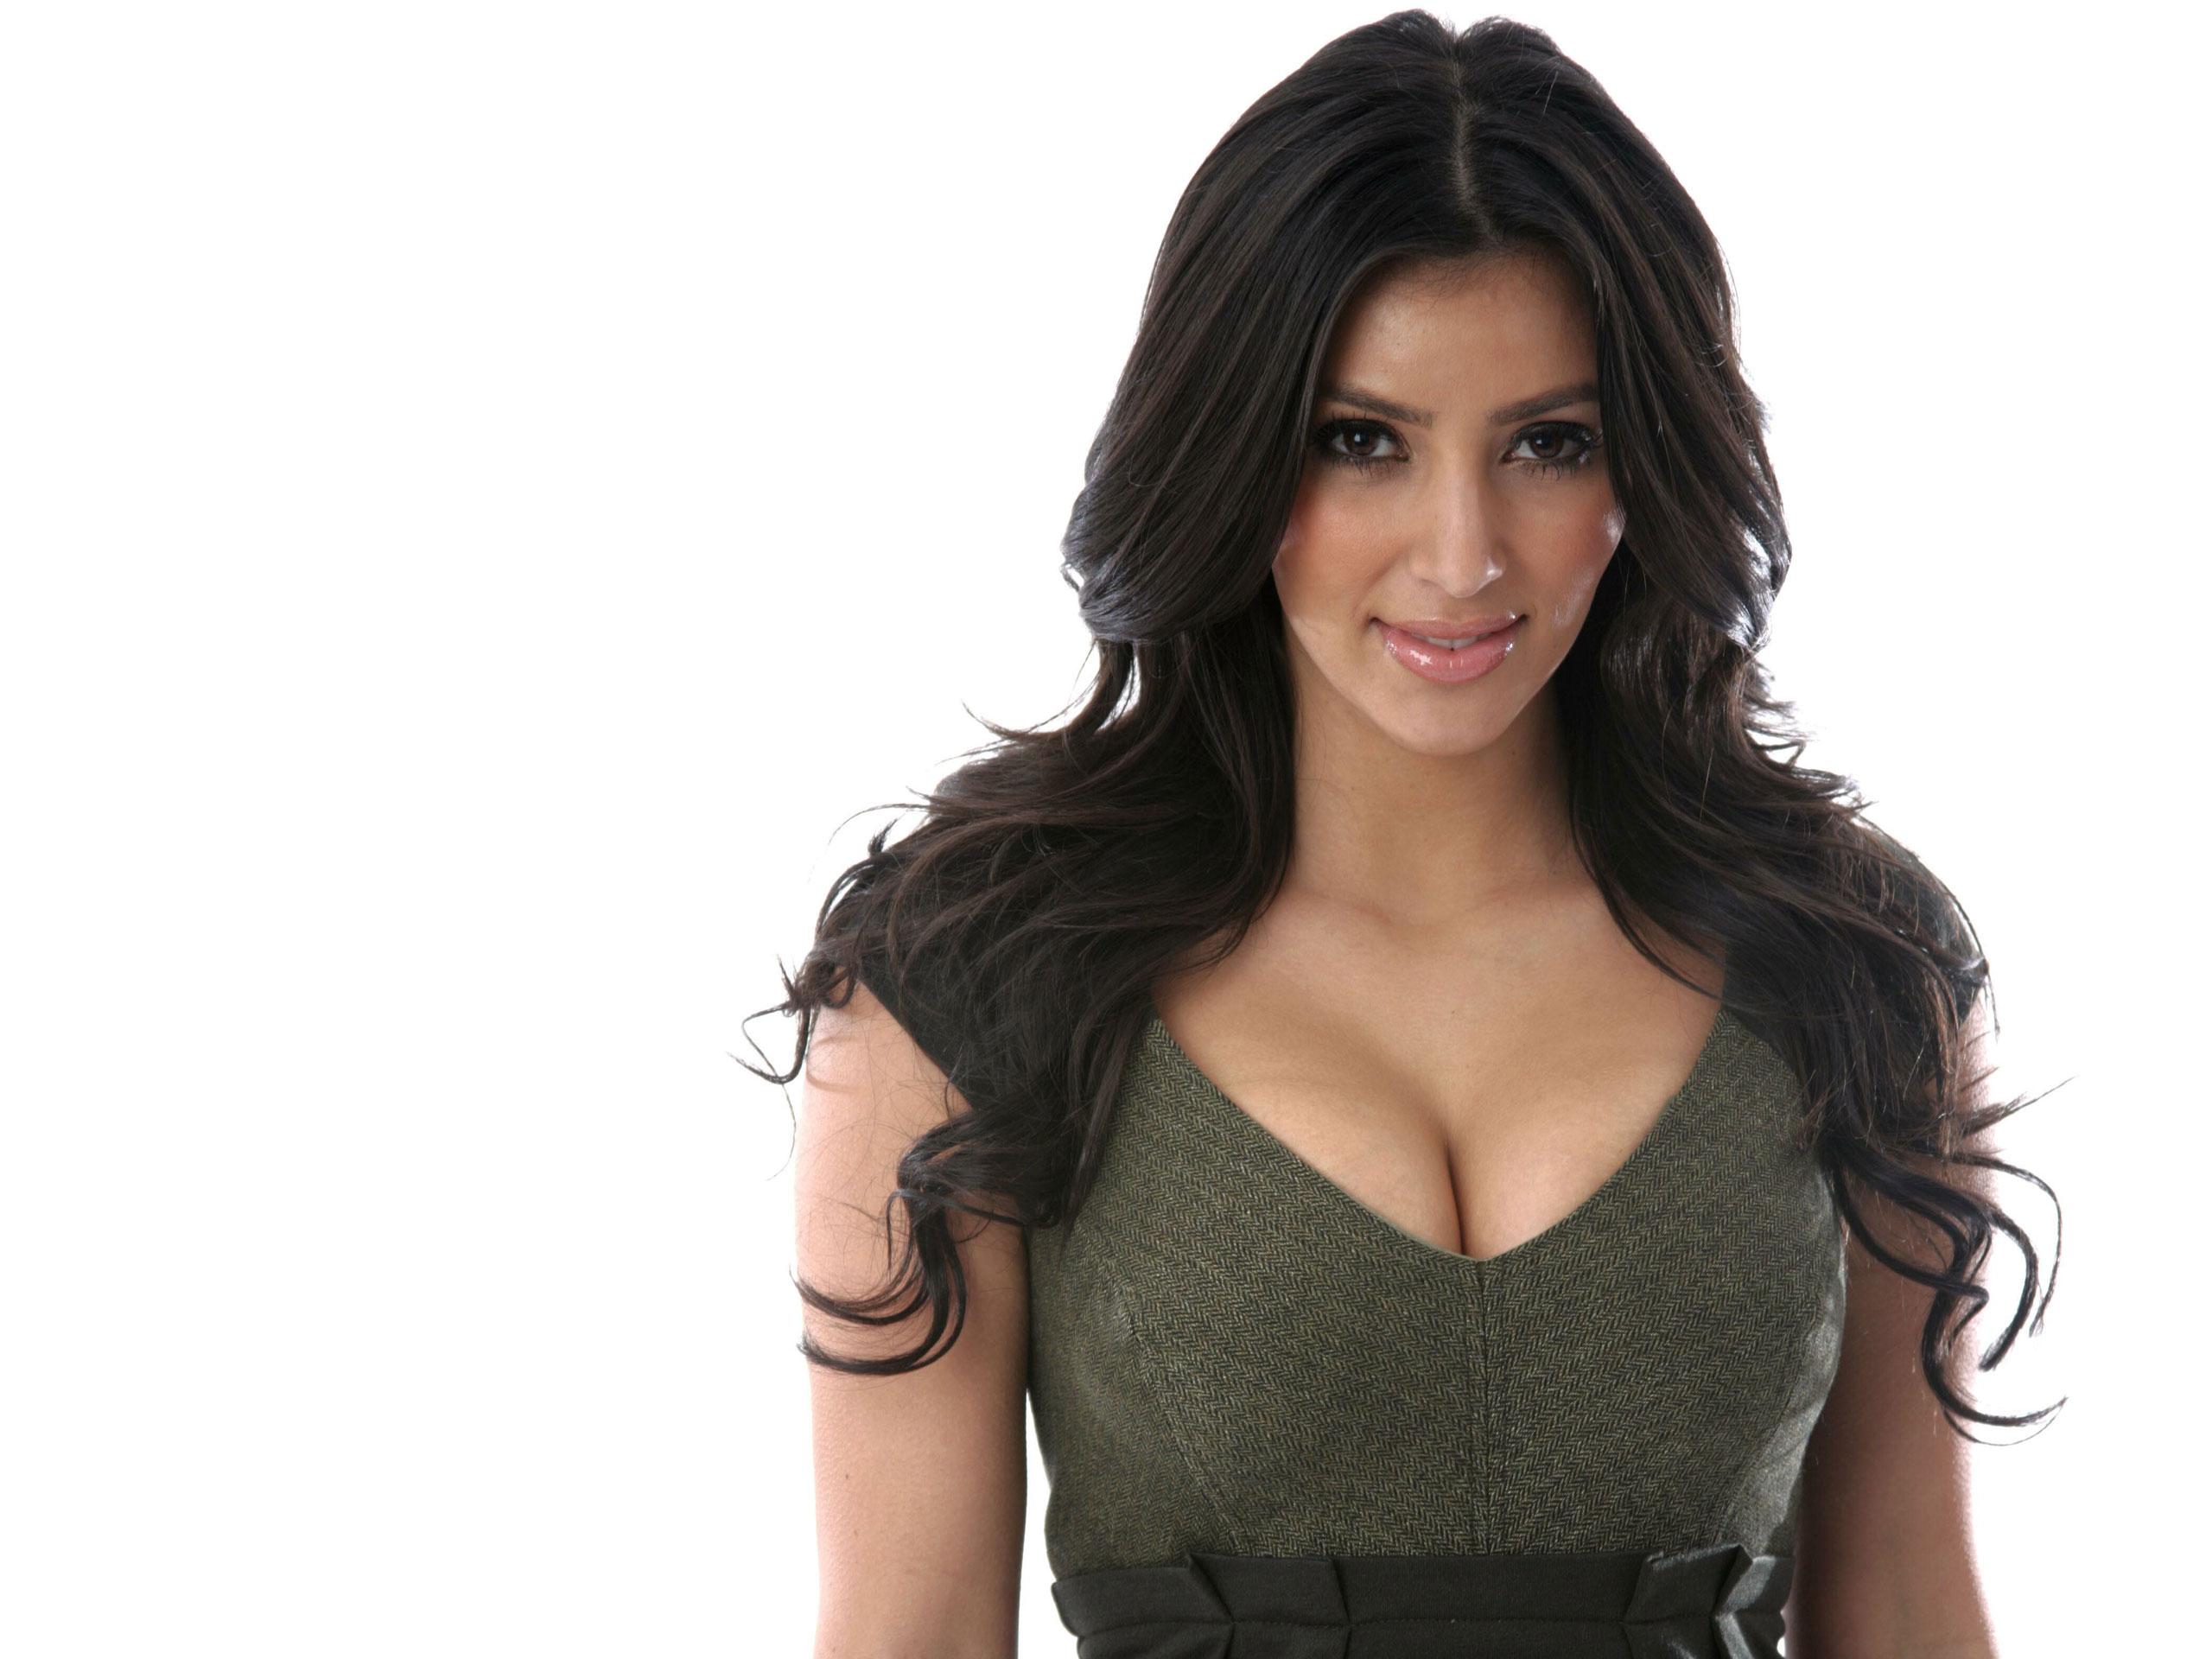 Kim Kardashian HD Wallpapers HD Wallpapers 2560x1920